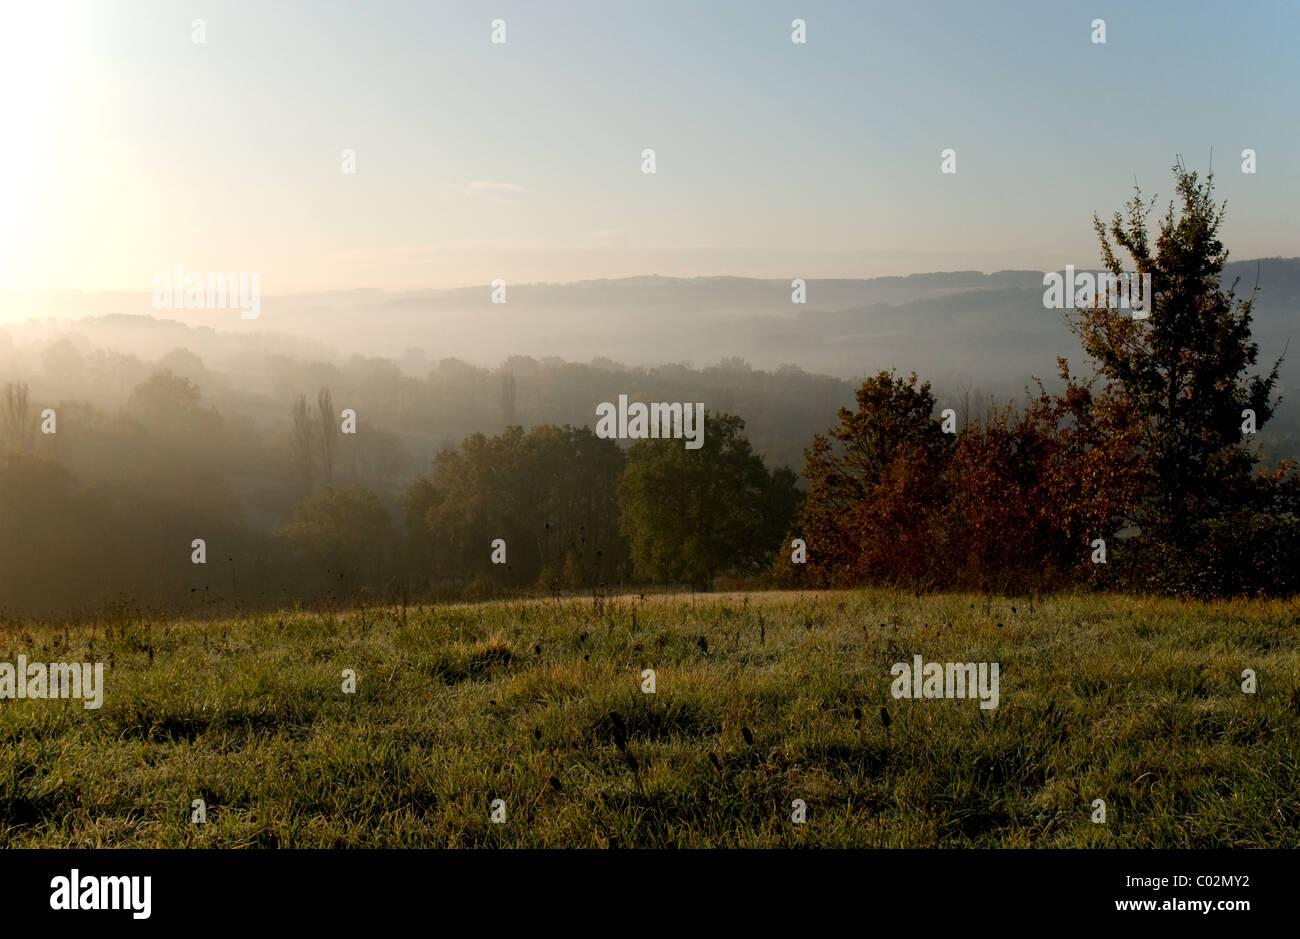 Early morning mist on the 'Vallée du Lot' France - Stock Image